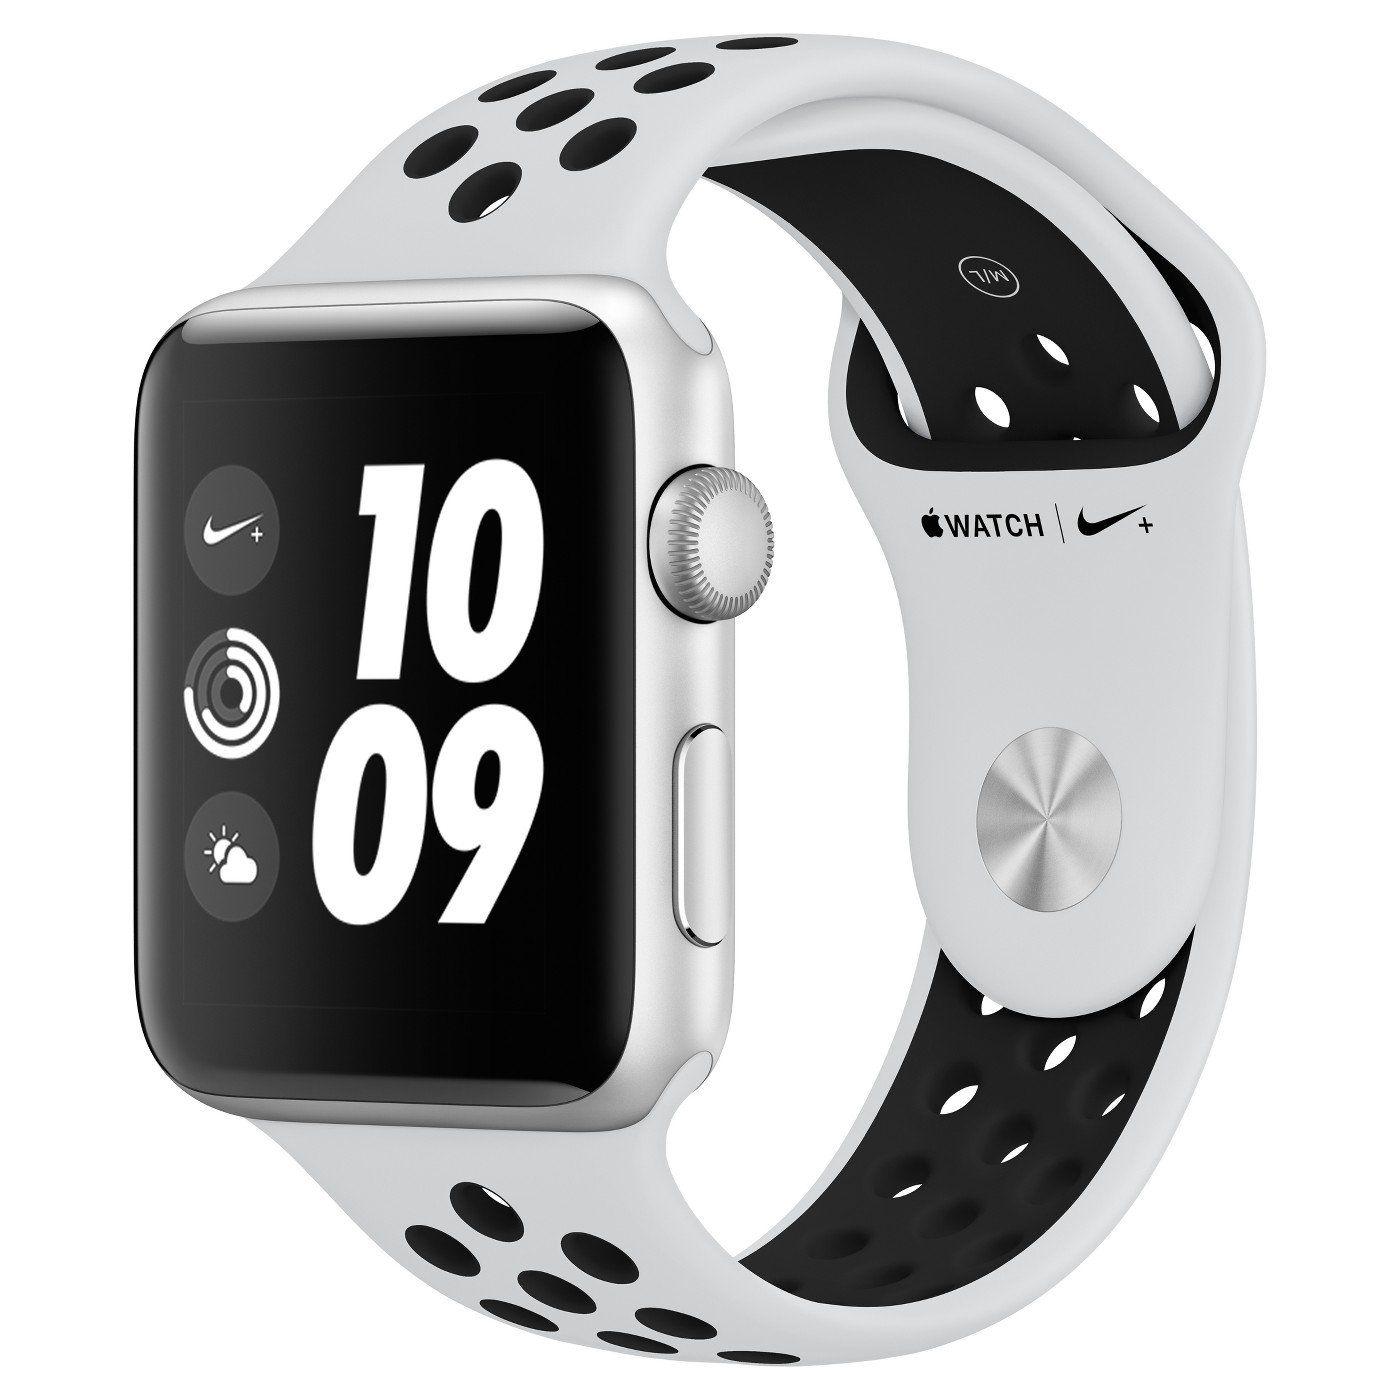 Apple Watch Nike+ Series 3 (GPS), 38mm Silver Aluminum